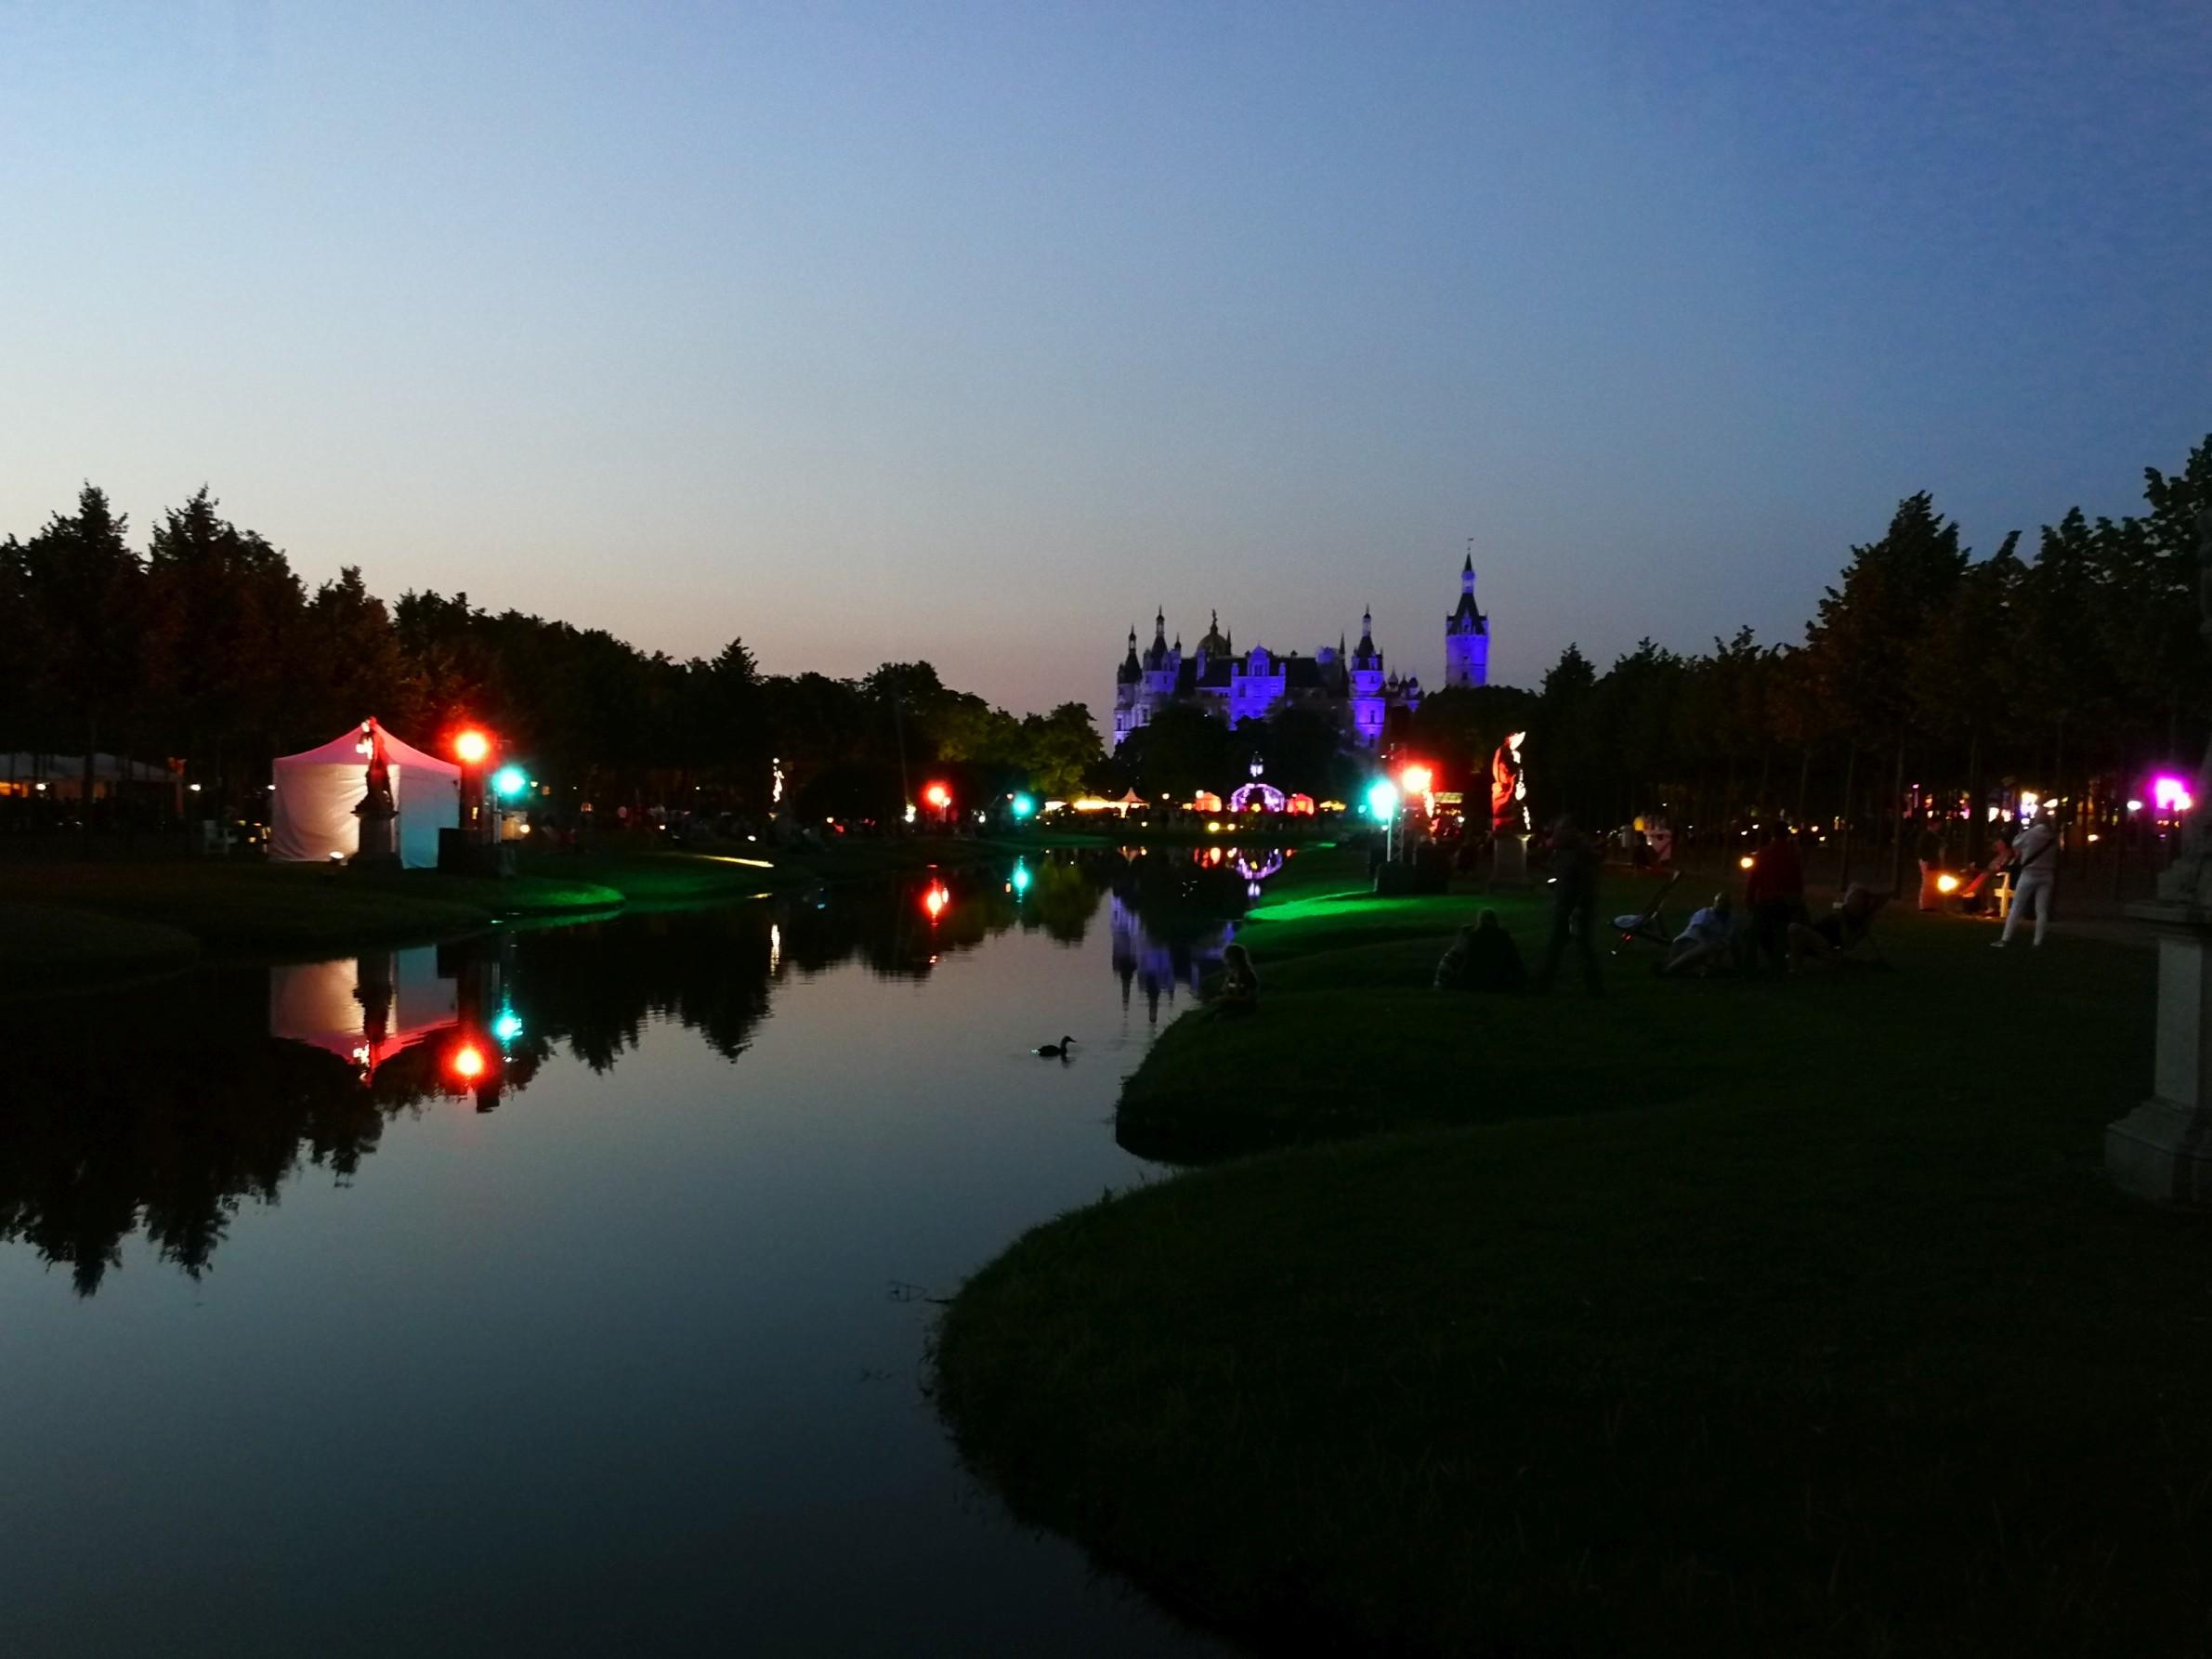 Schlossgartenlust_2019_Schwerinl_IMG_20190803_214650